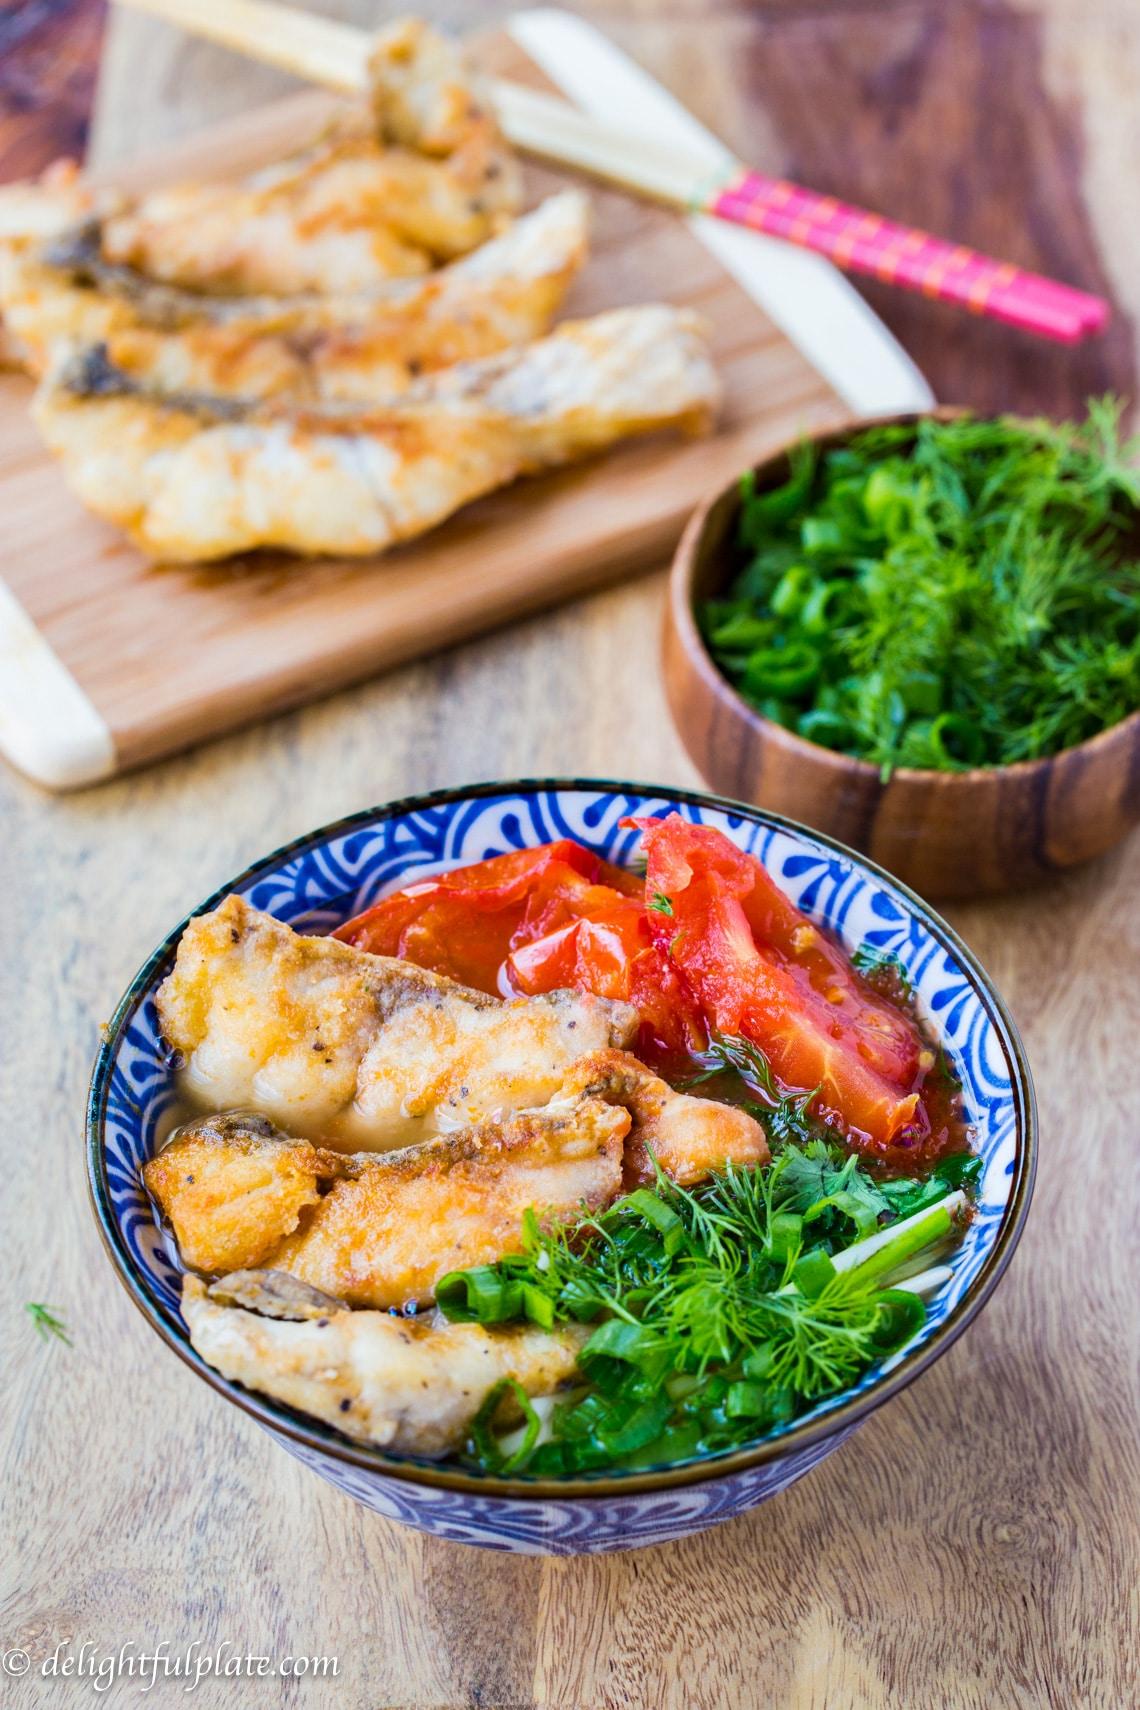 Vietnamese Fried Fish Vermicelli Noodle Soup (Bun Ca) - Delightful Plate